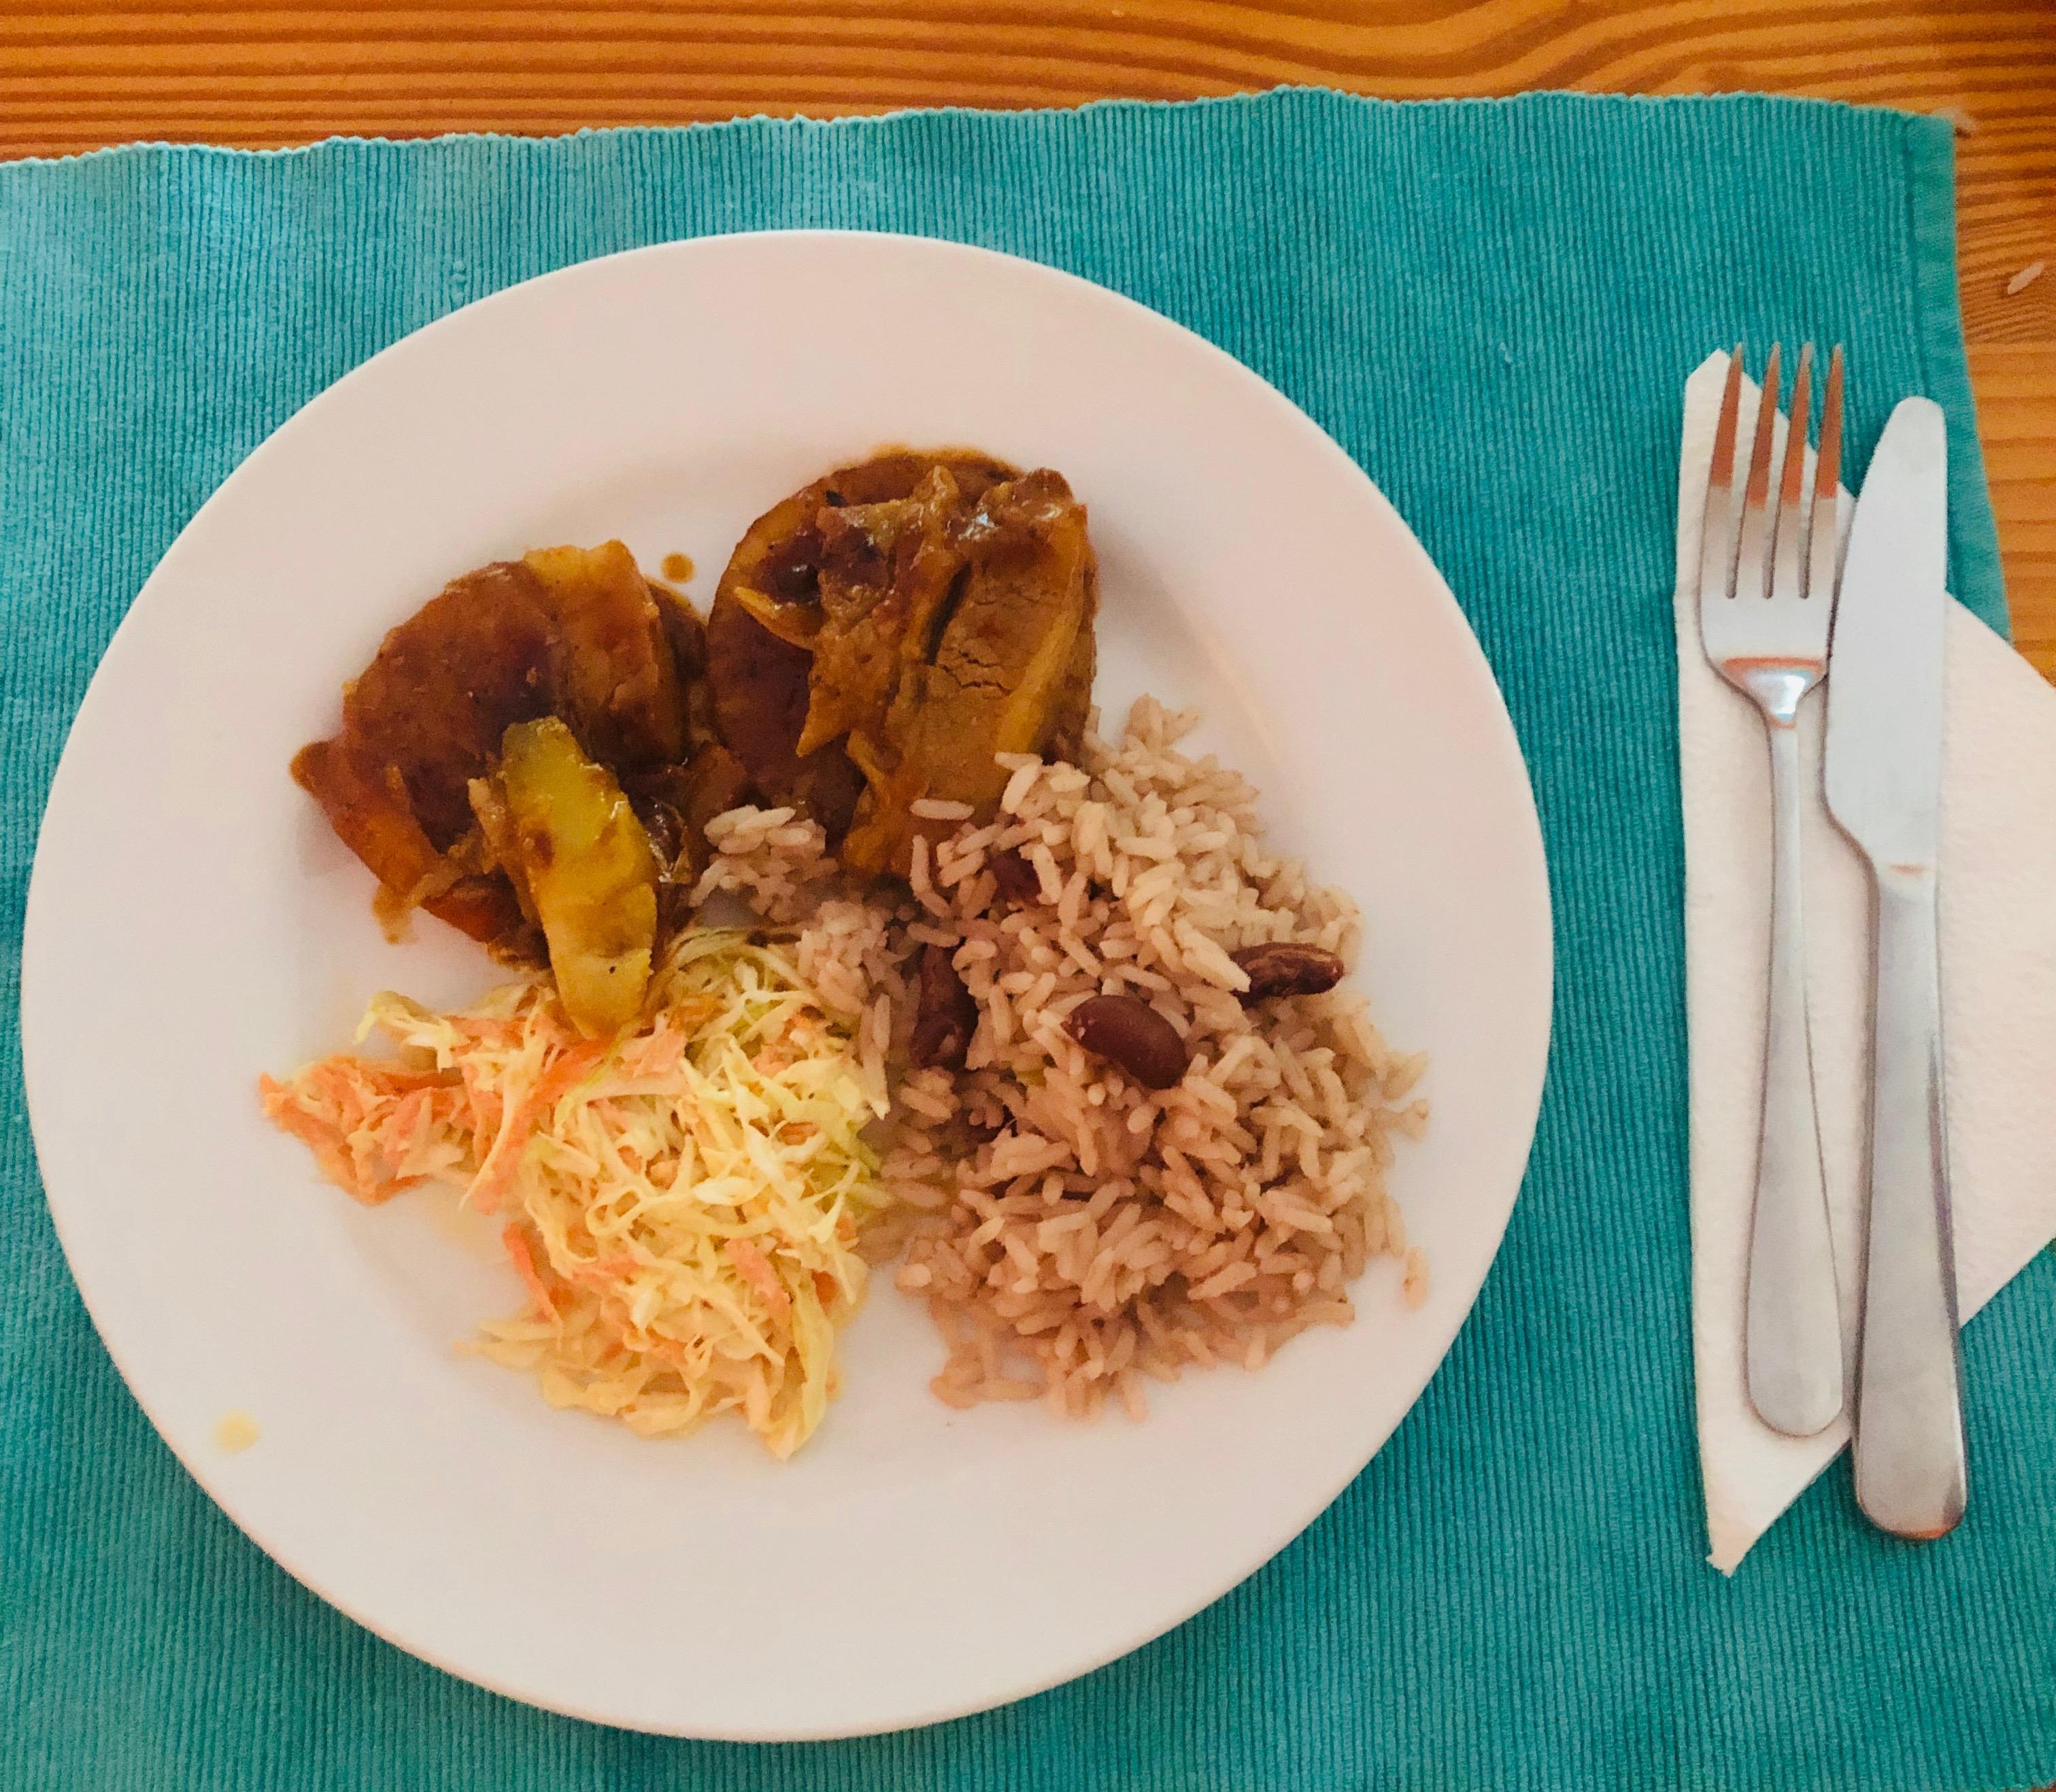 Suzette's Jamaican Cuisine